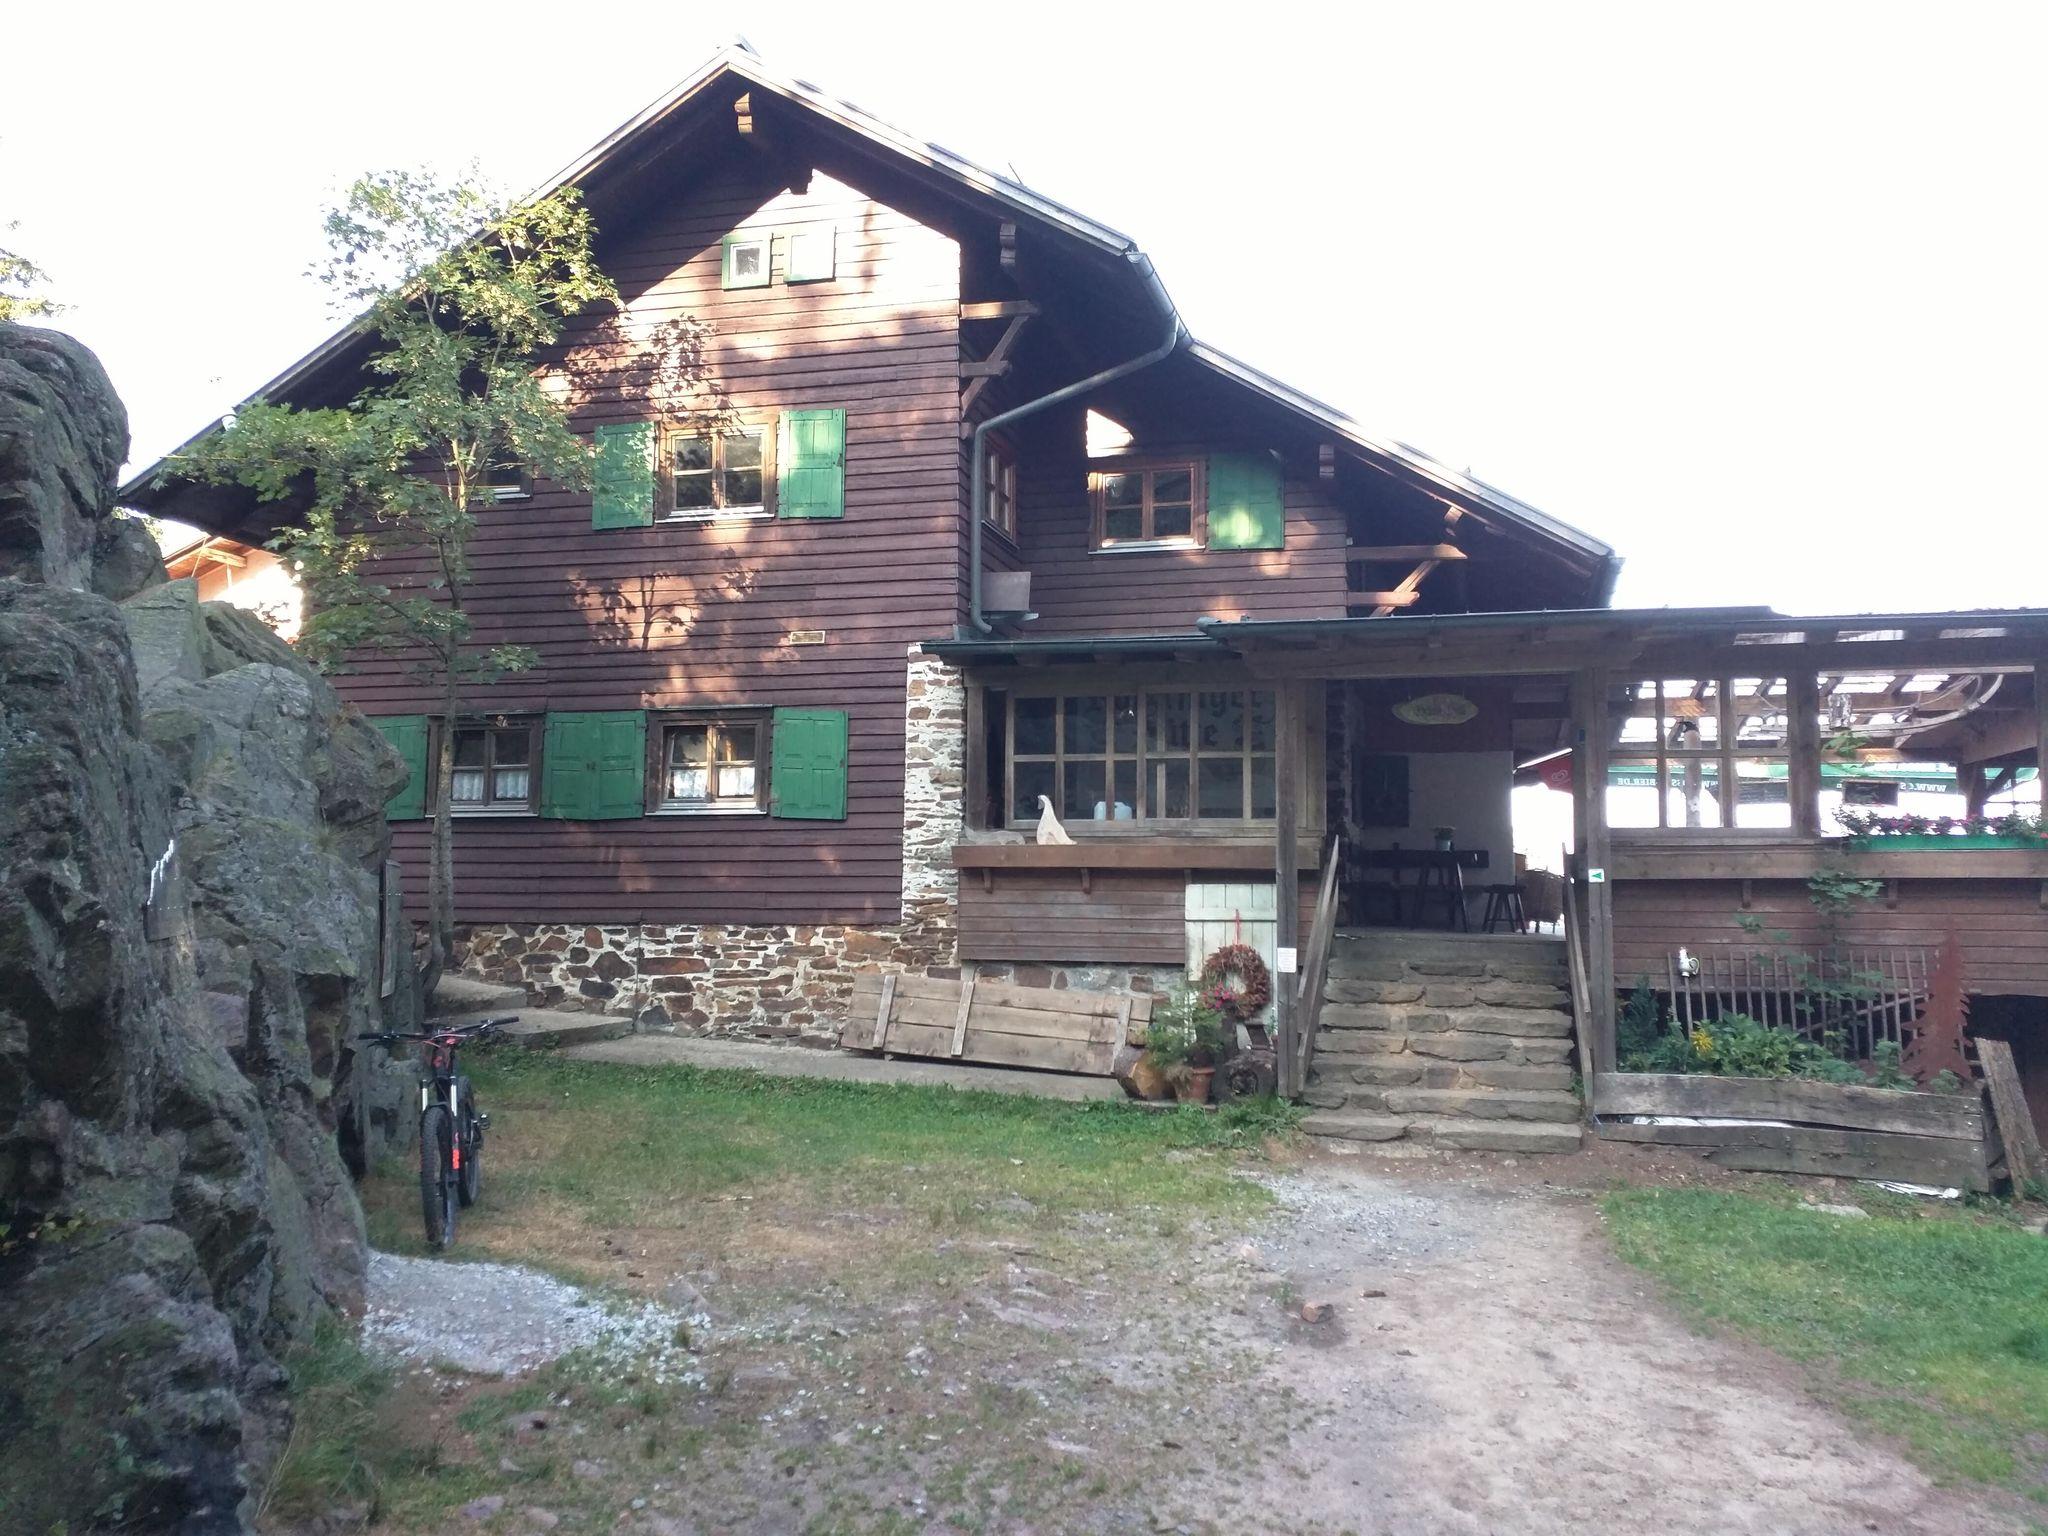 Kötztinger Hütte auf dem Kaitersberg